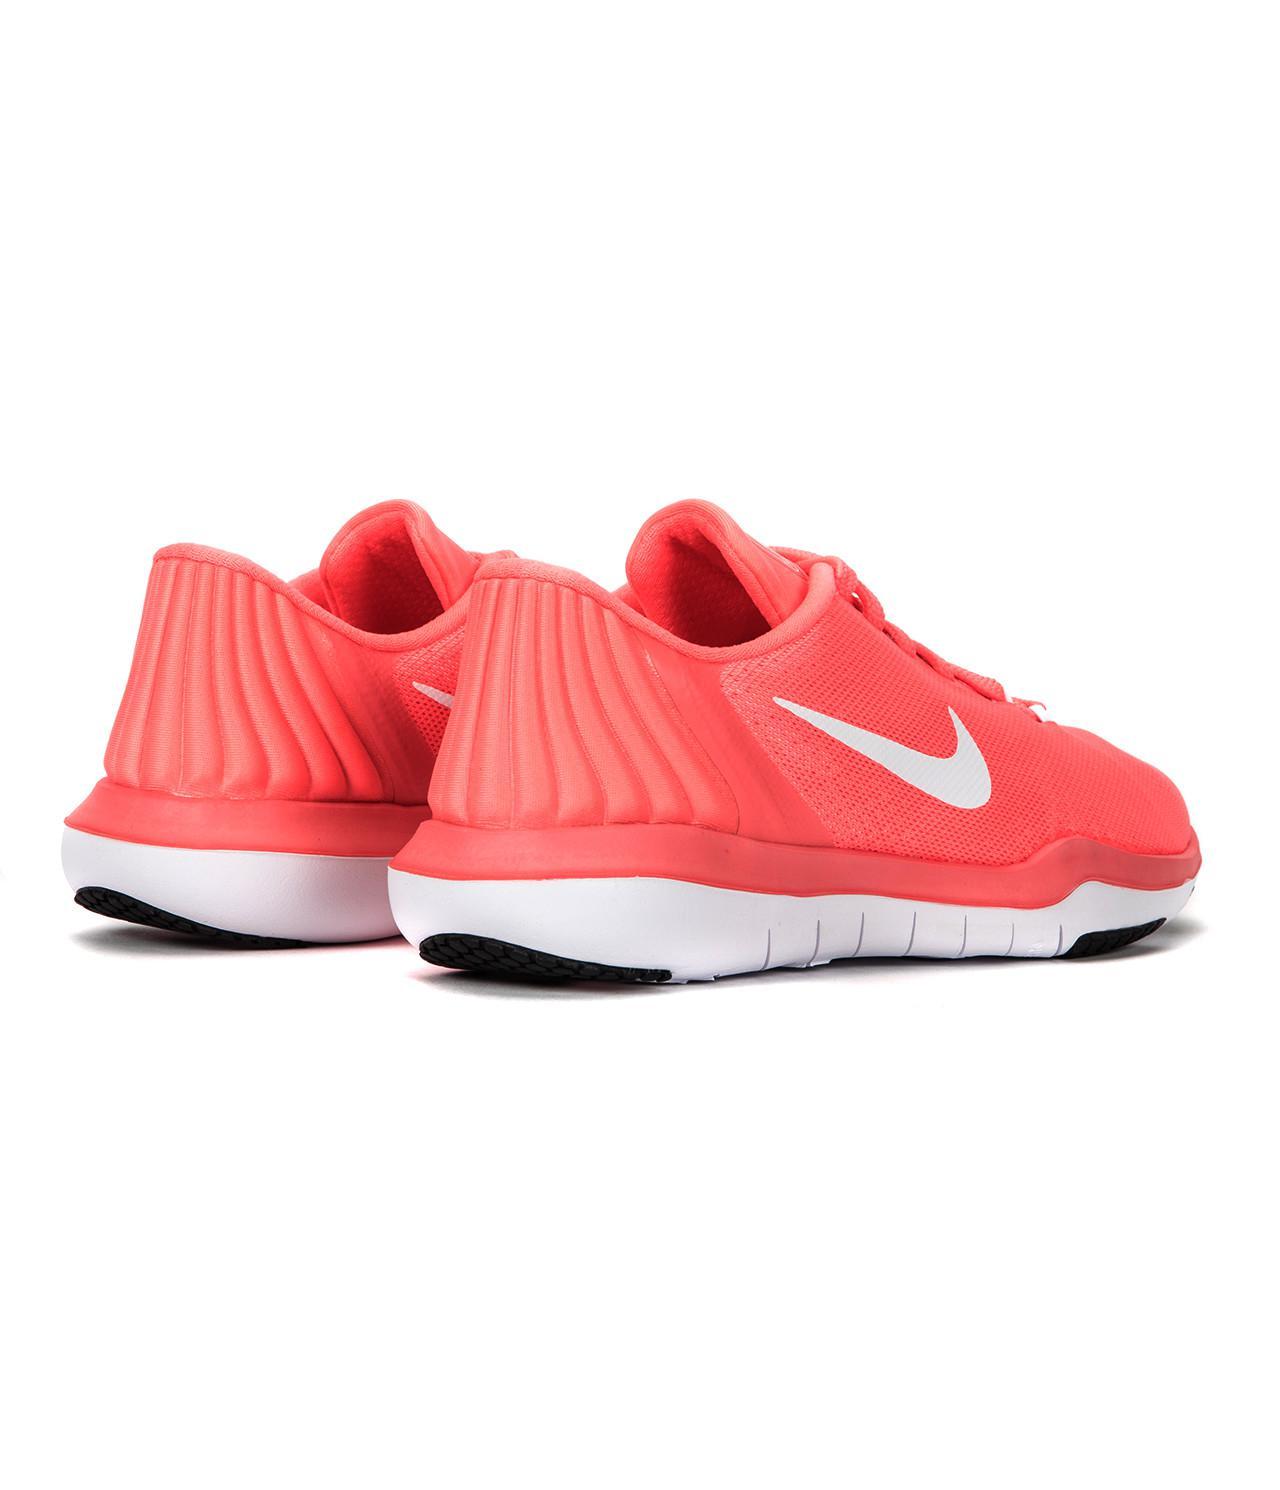 426bccaa51fb Nike - Red Flex Supreme Tr 5 for Men - Lyst. View fullscreen